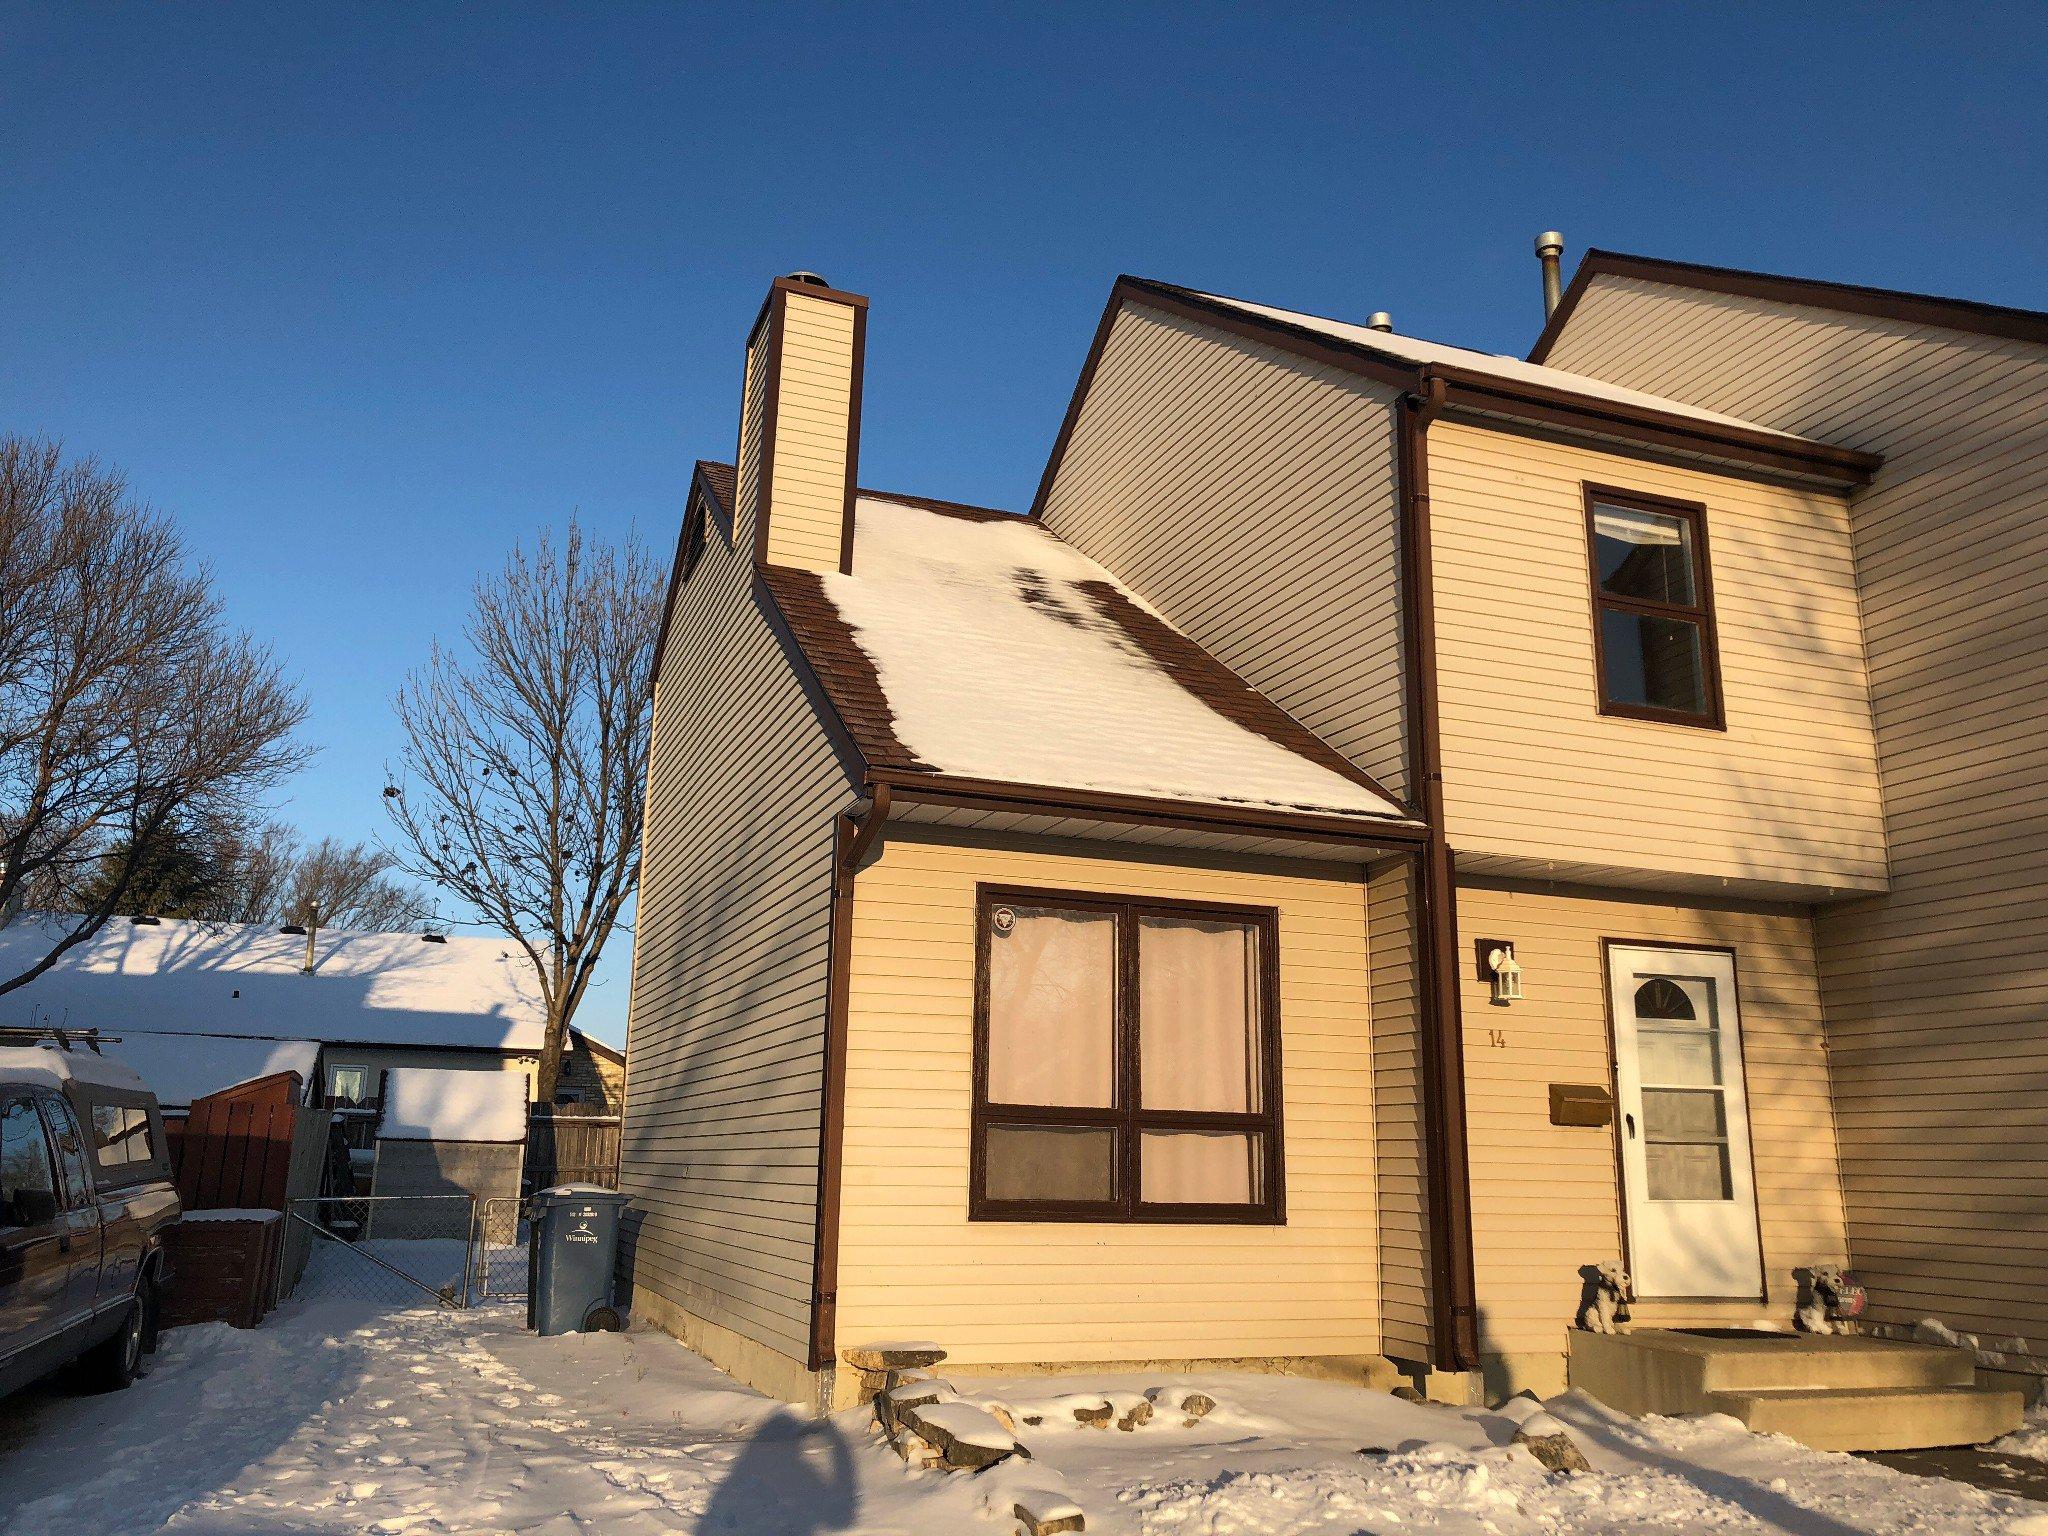 Main Photo: Garden City Family Home For Sale